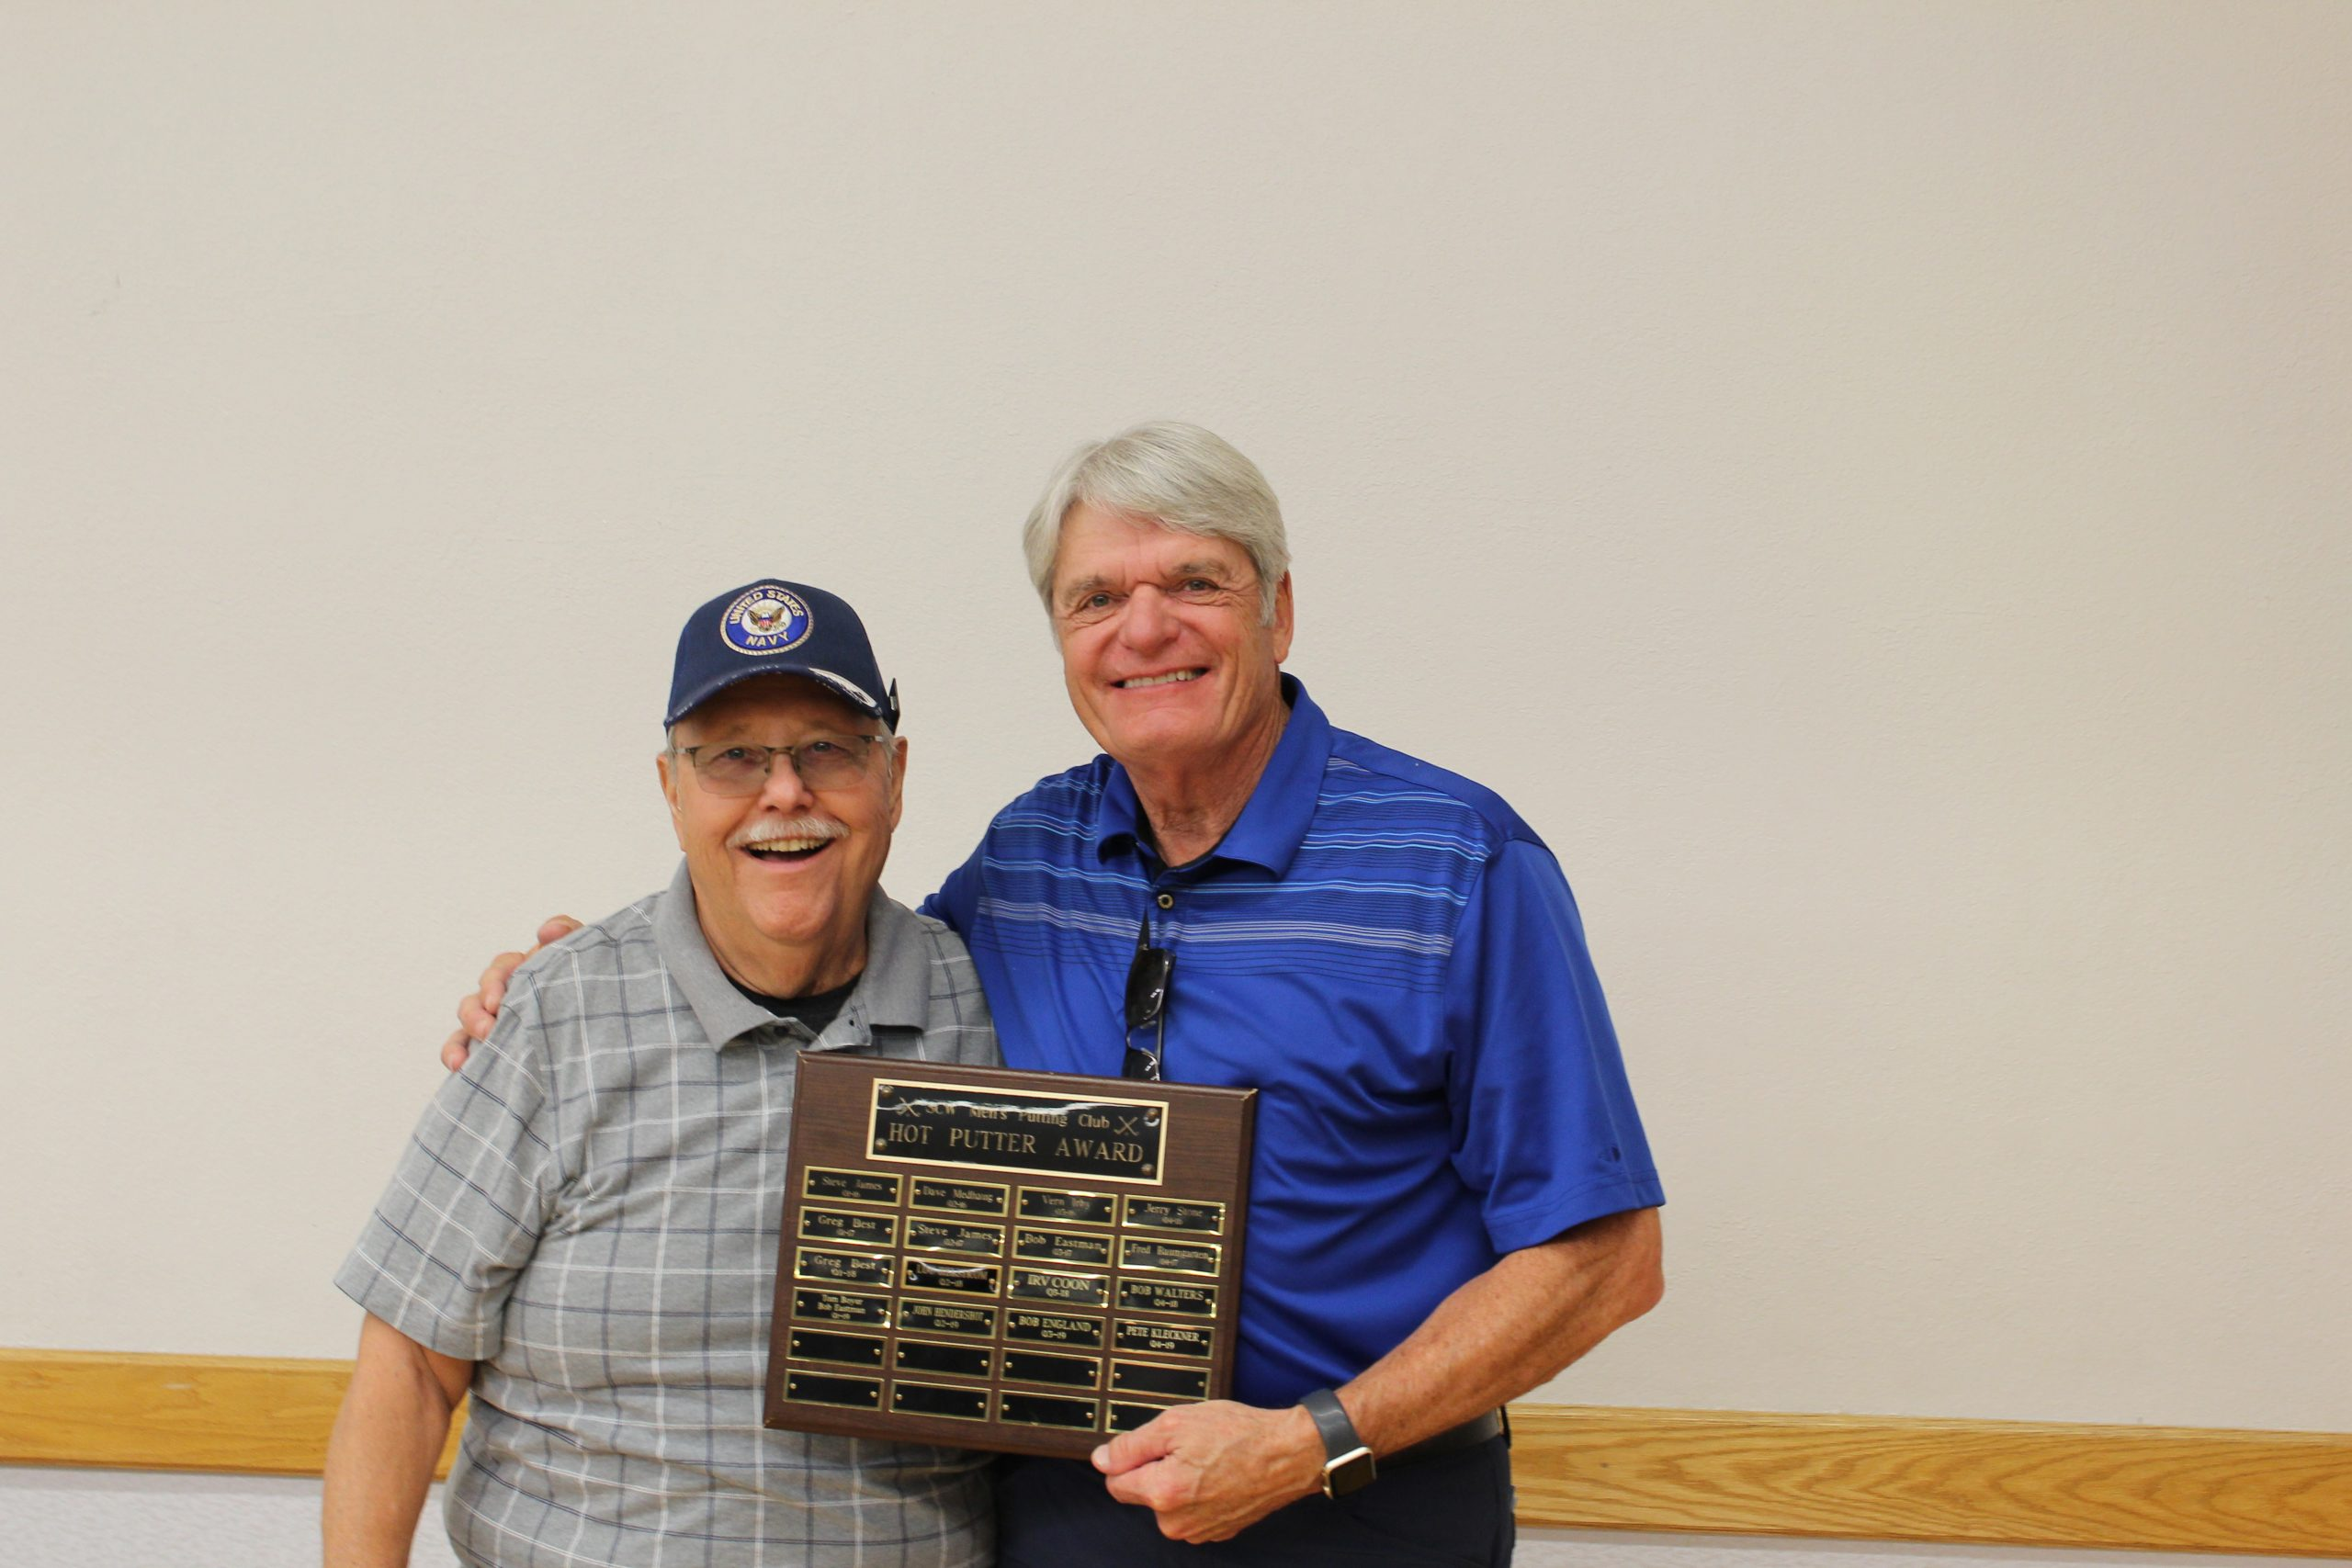 4th Quarter Paul Kleckner, presented by President Mike Scheuermann